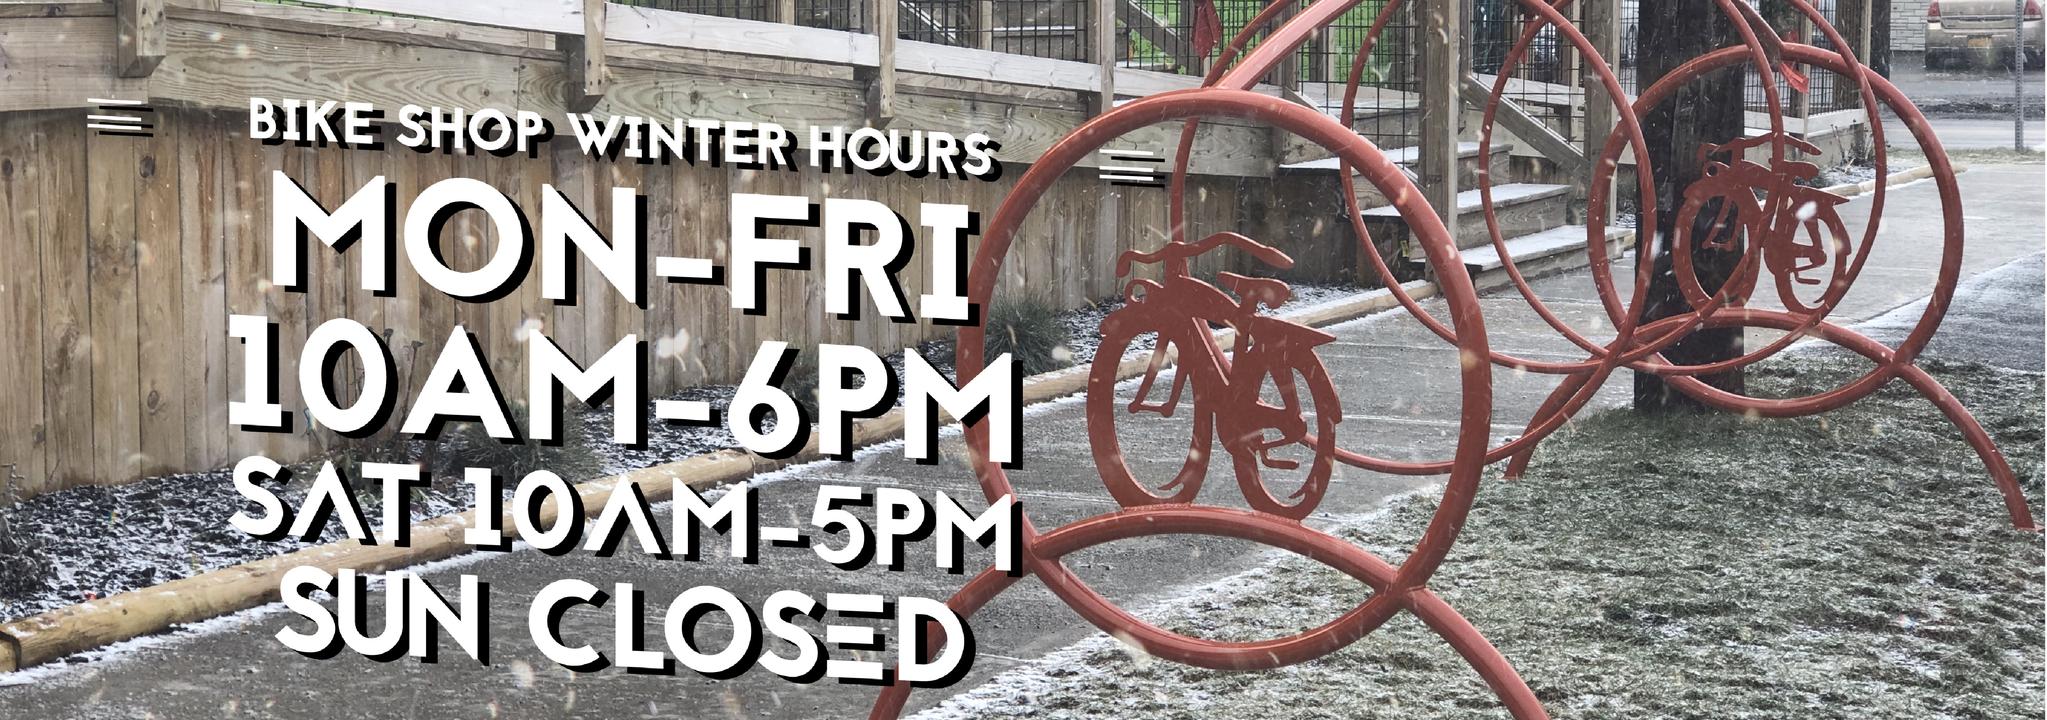 Bike Shop winter